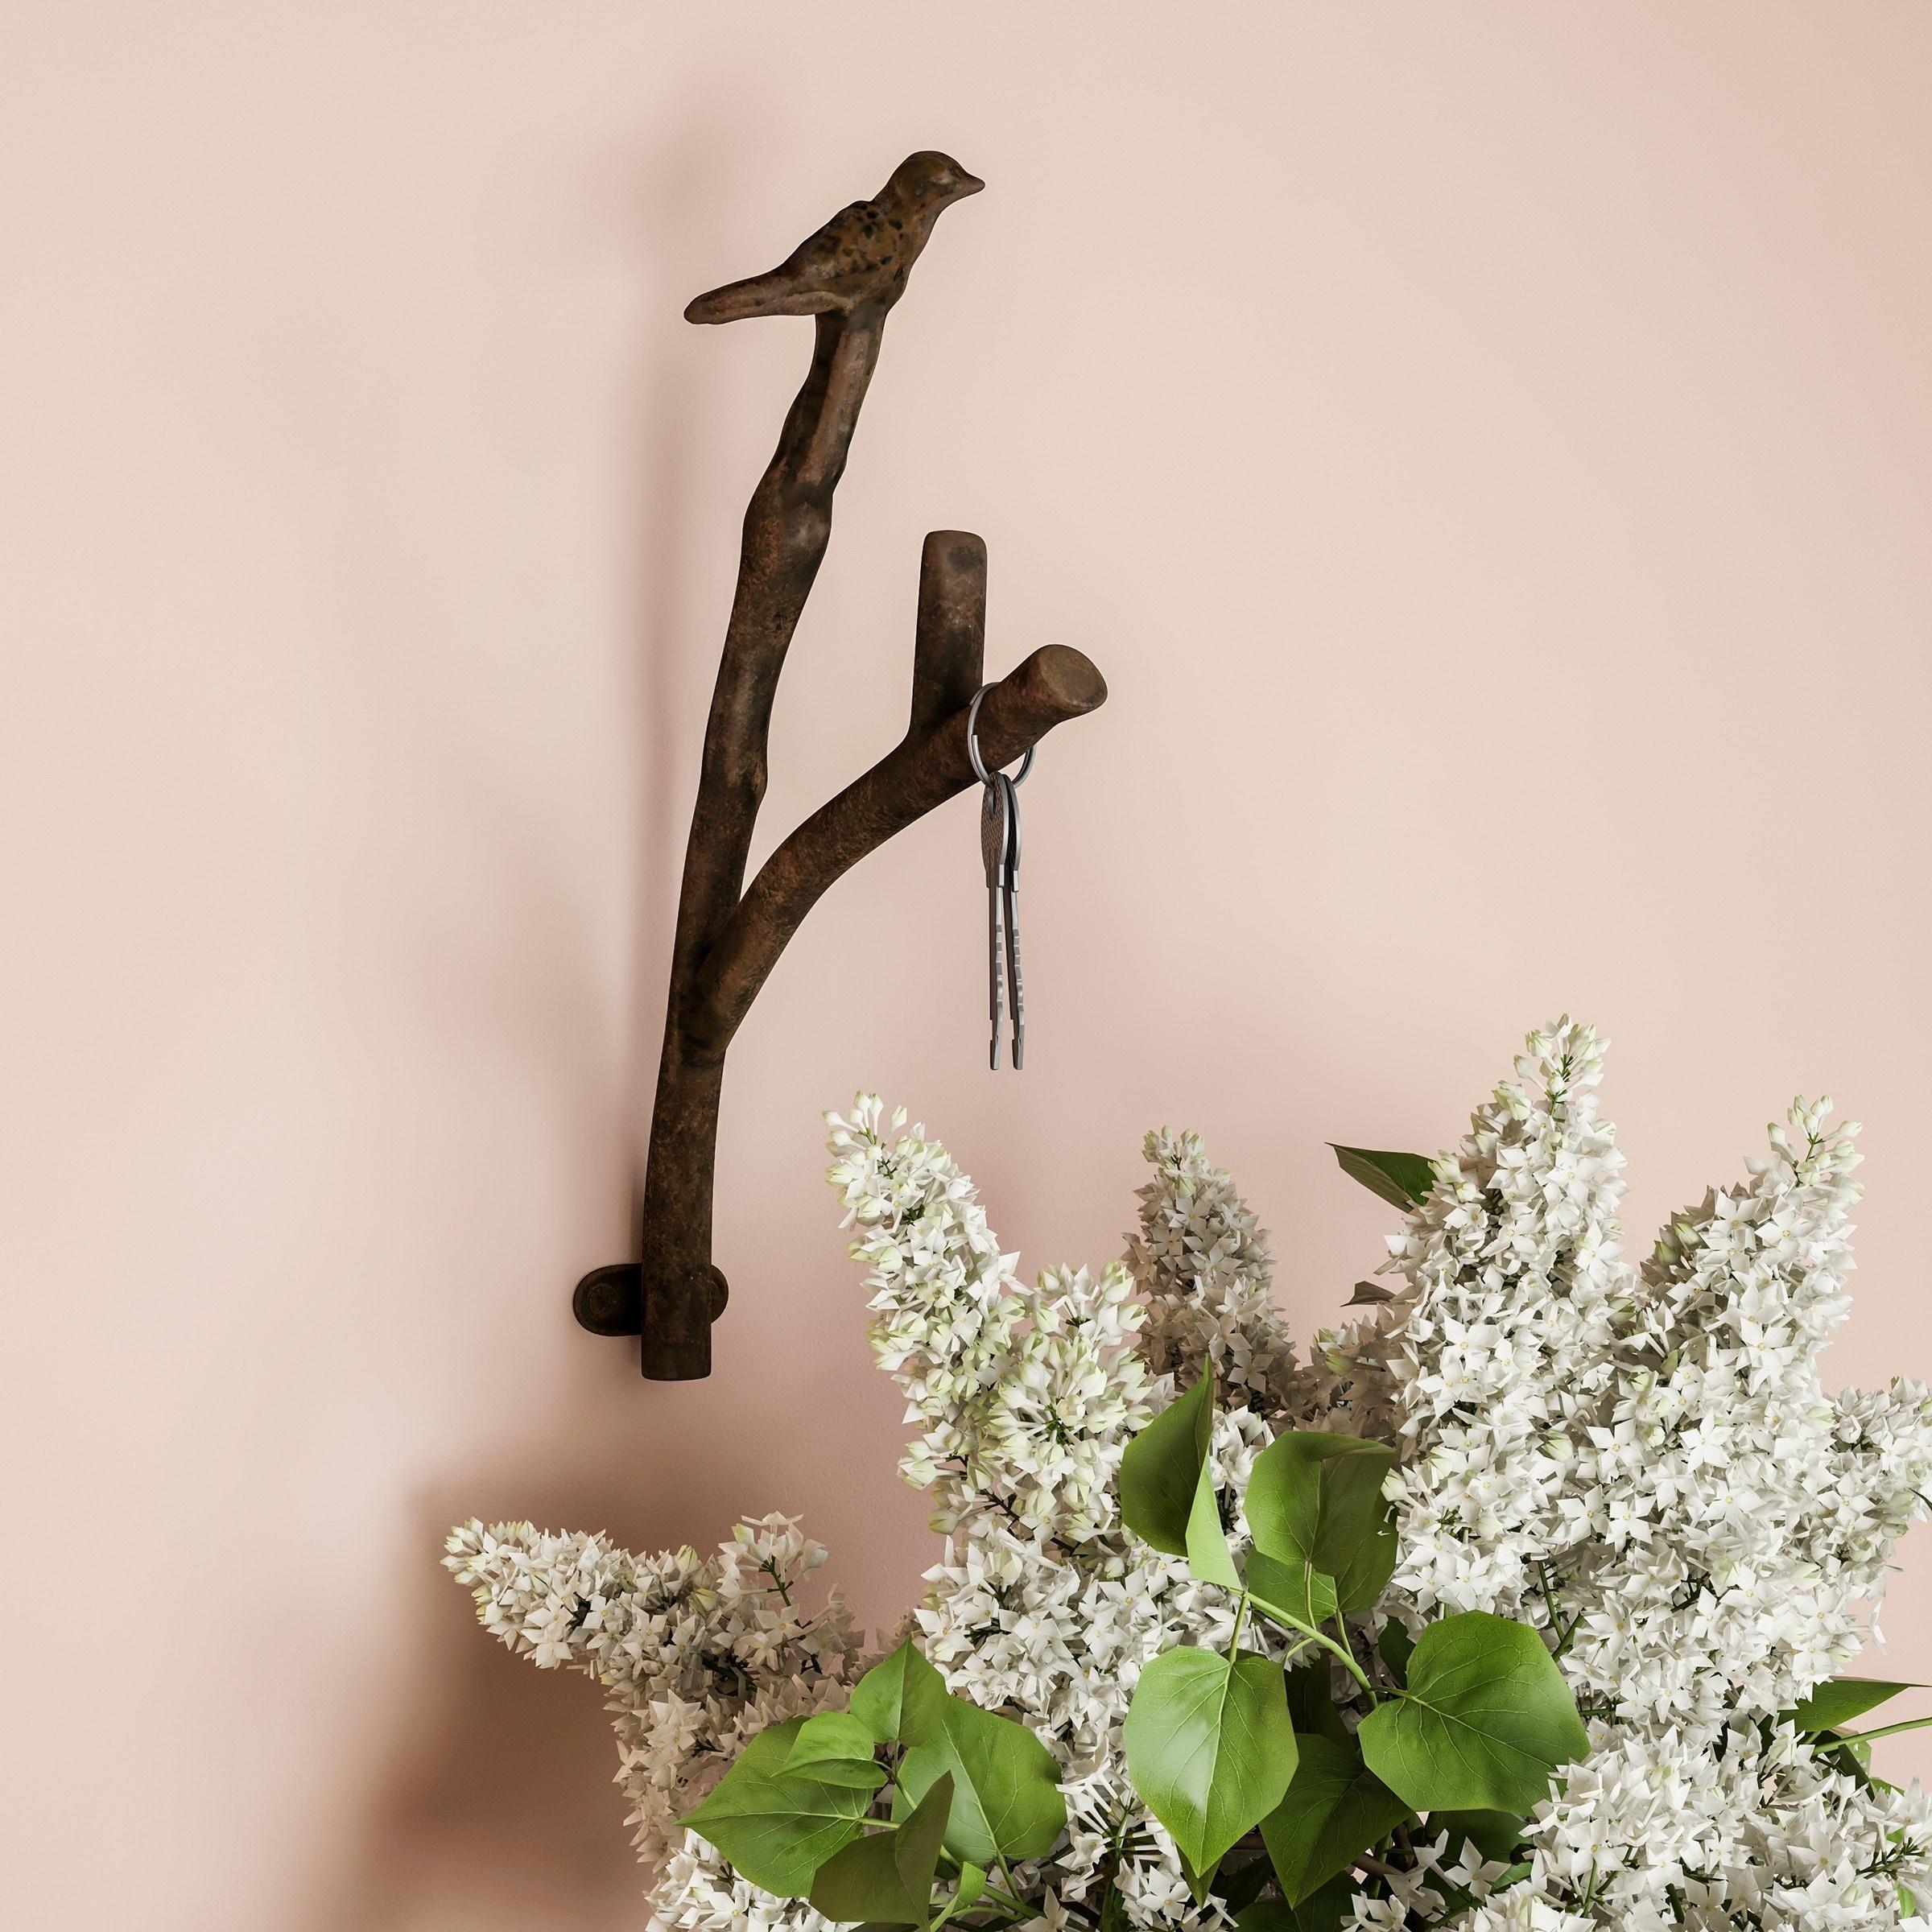 Decorative Bird On Tree Branch Hook Cast Iron Shabby Chic Rustic Wall Mount Hooks Lavish Home Overstock 22971319